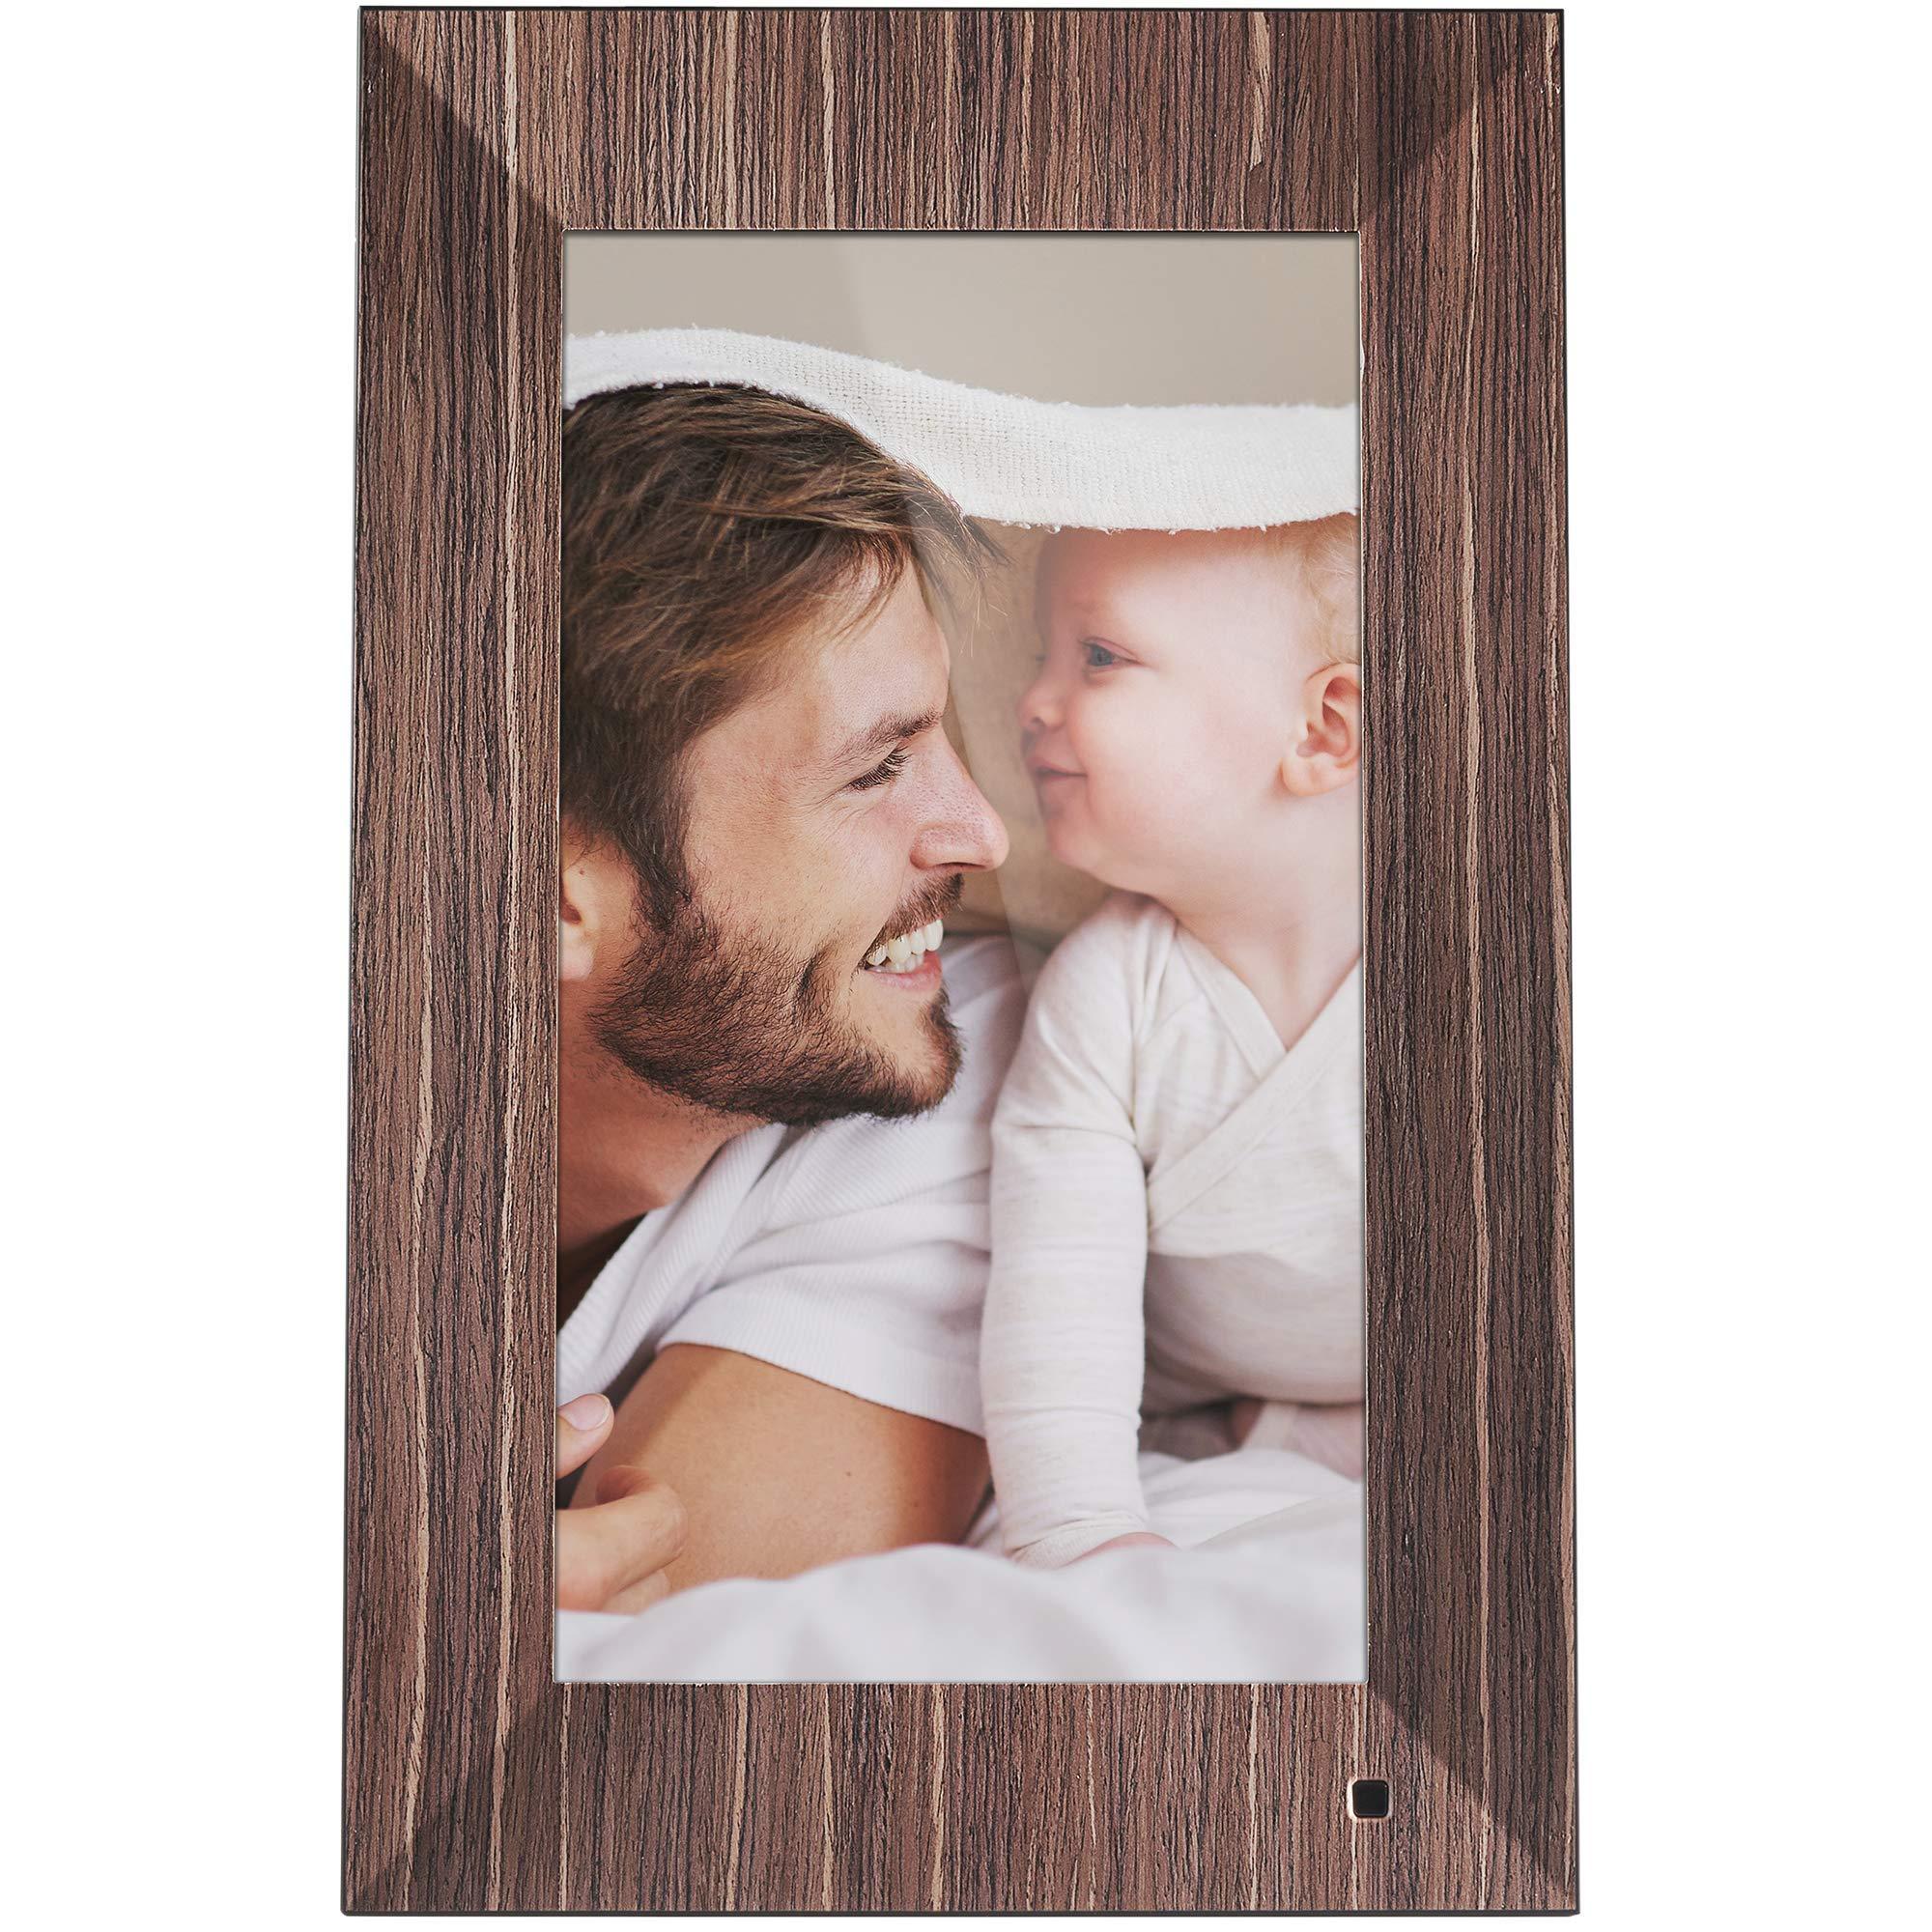 NIX Lux Digital Photo Frame 13.3 inch X13B, Wood. Electronic Photo Frame USB SD